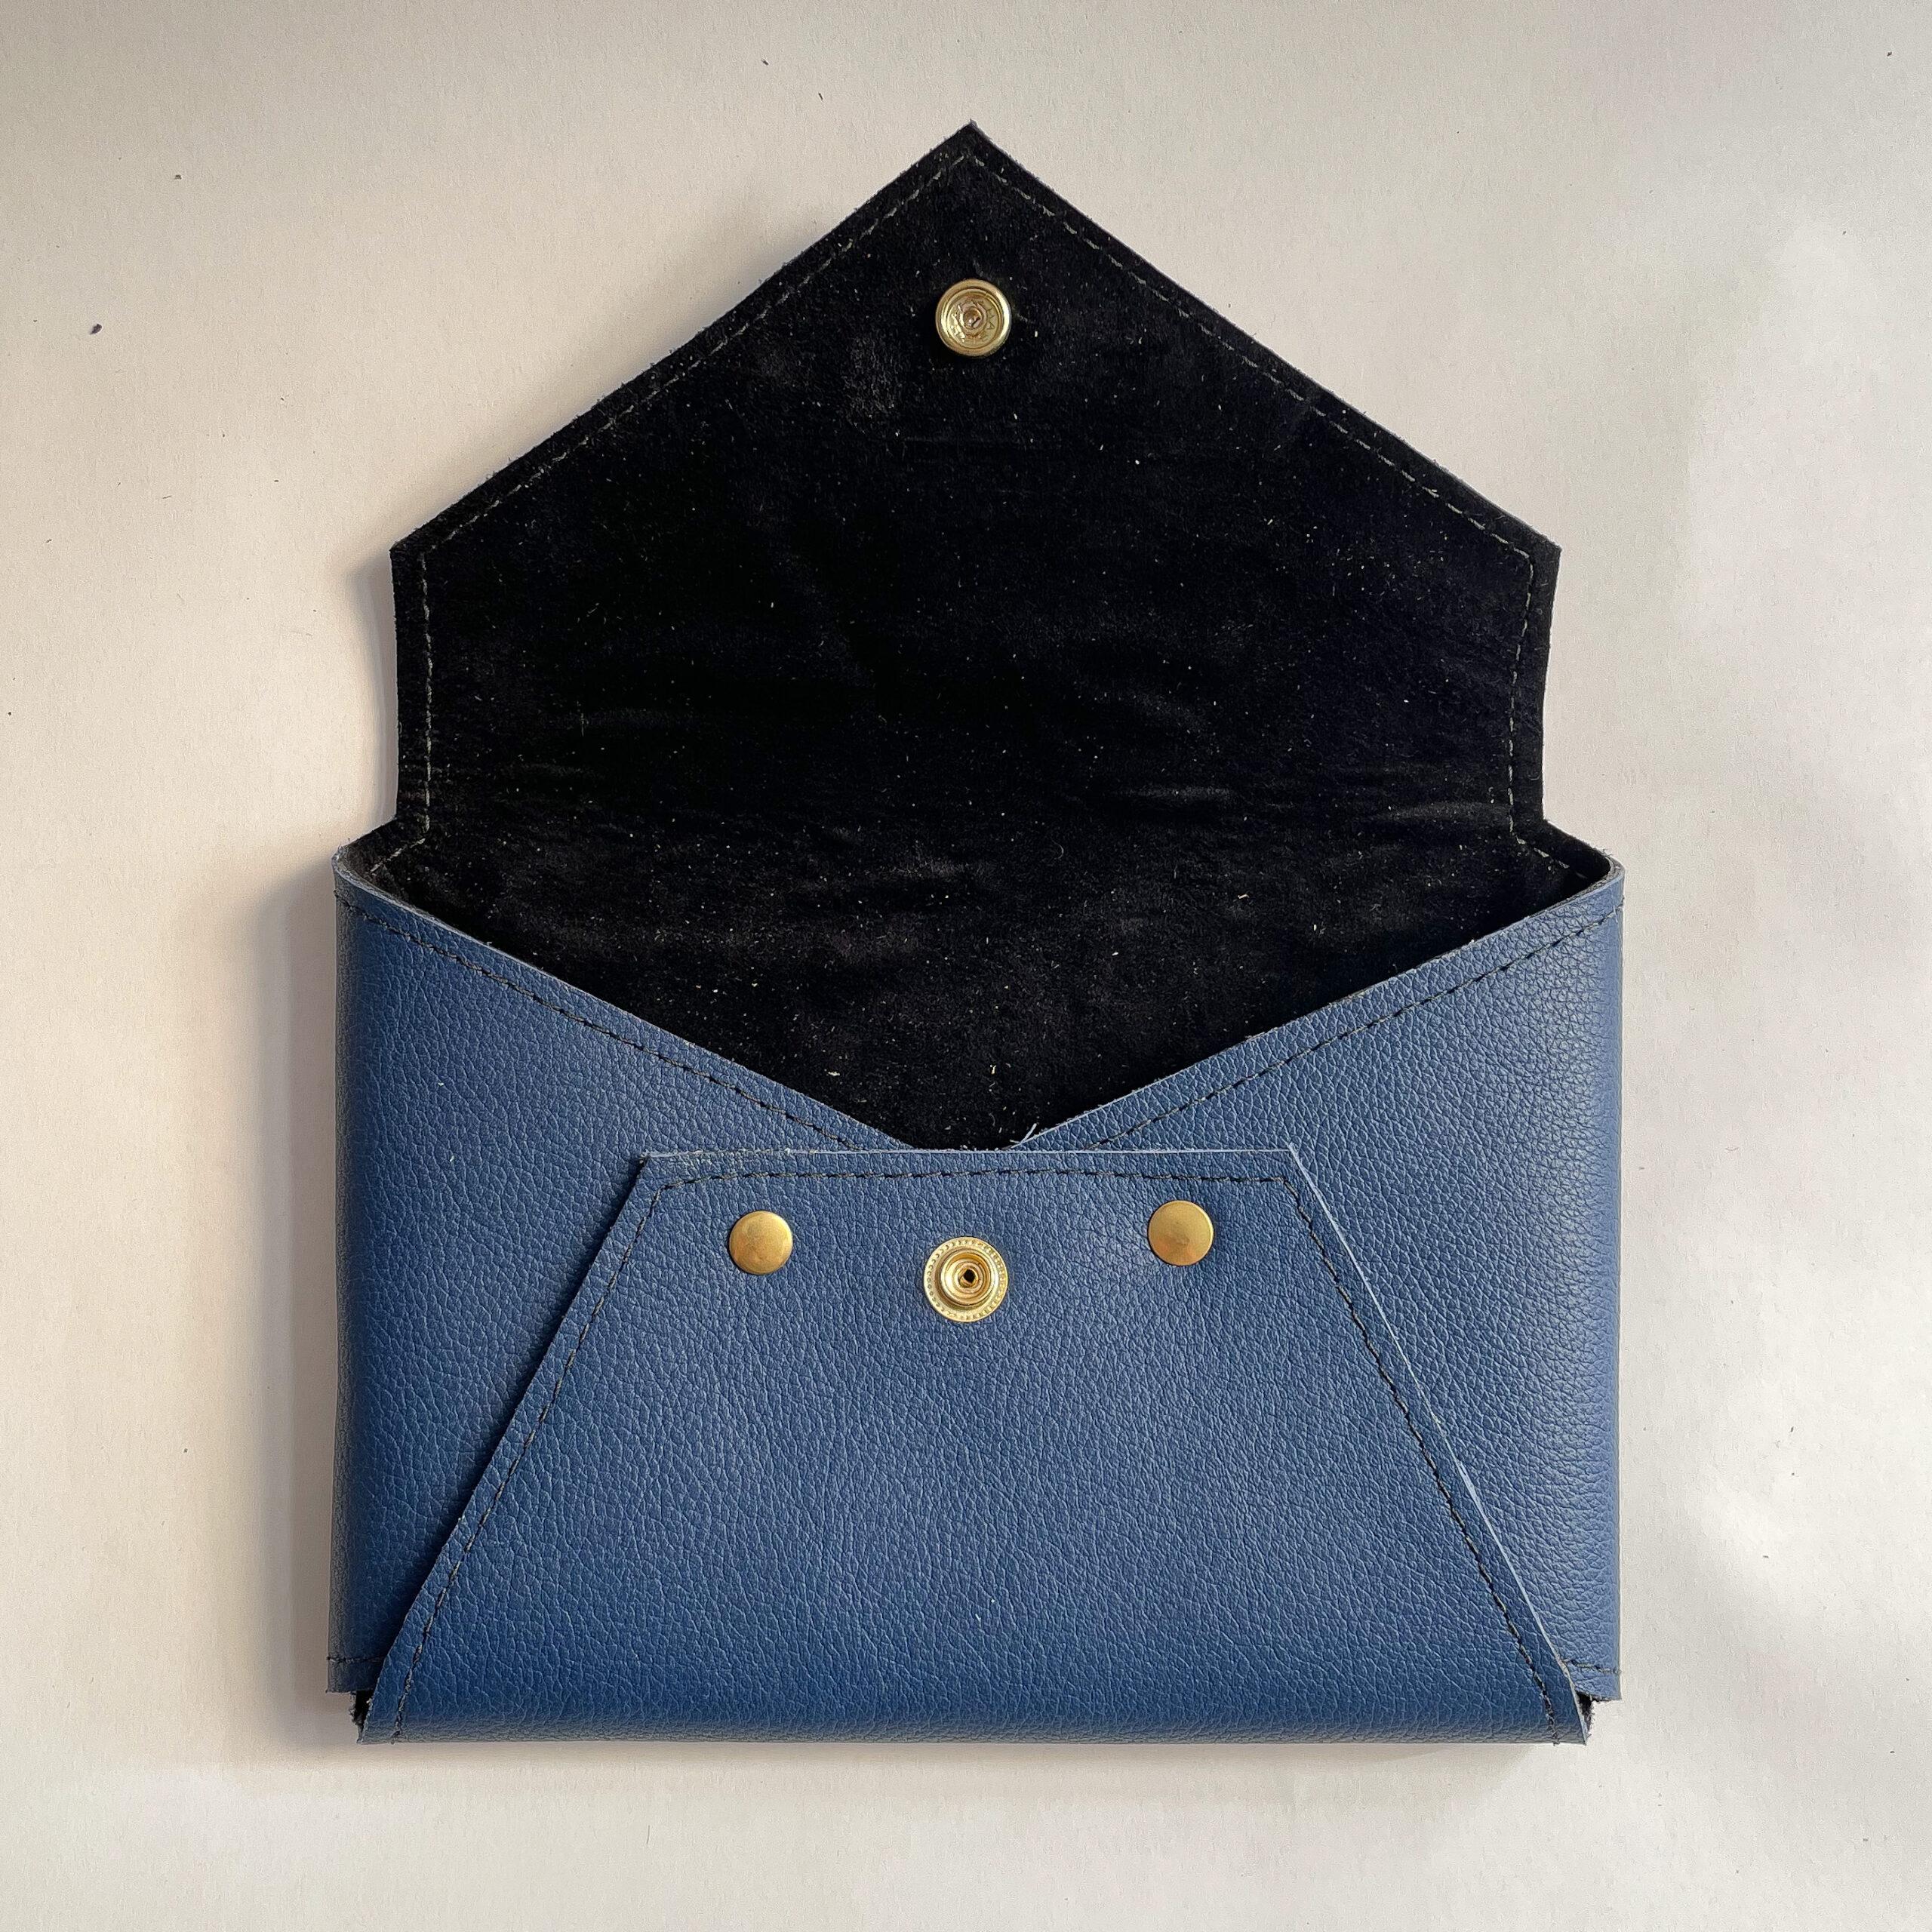 Open blue Envelope Clutch showing black lining